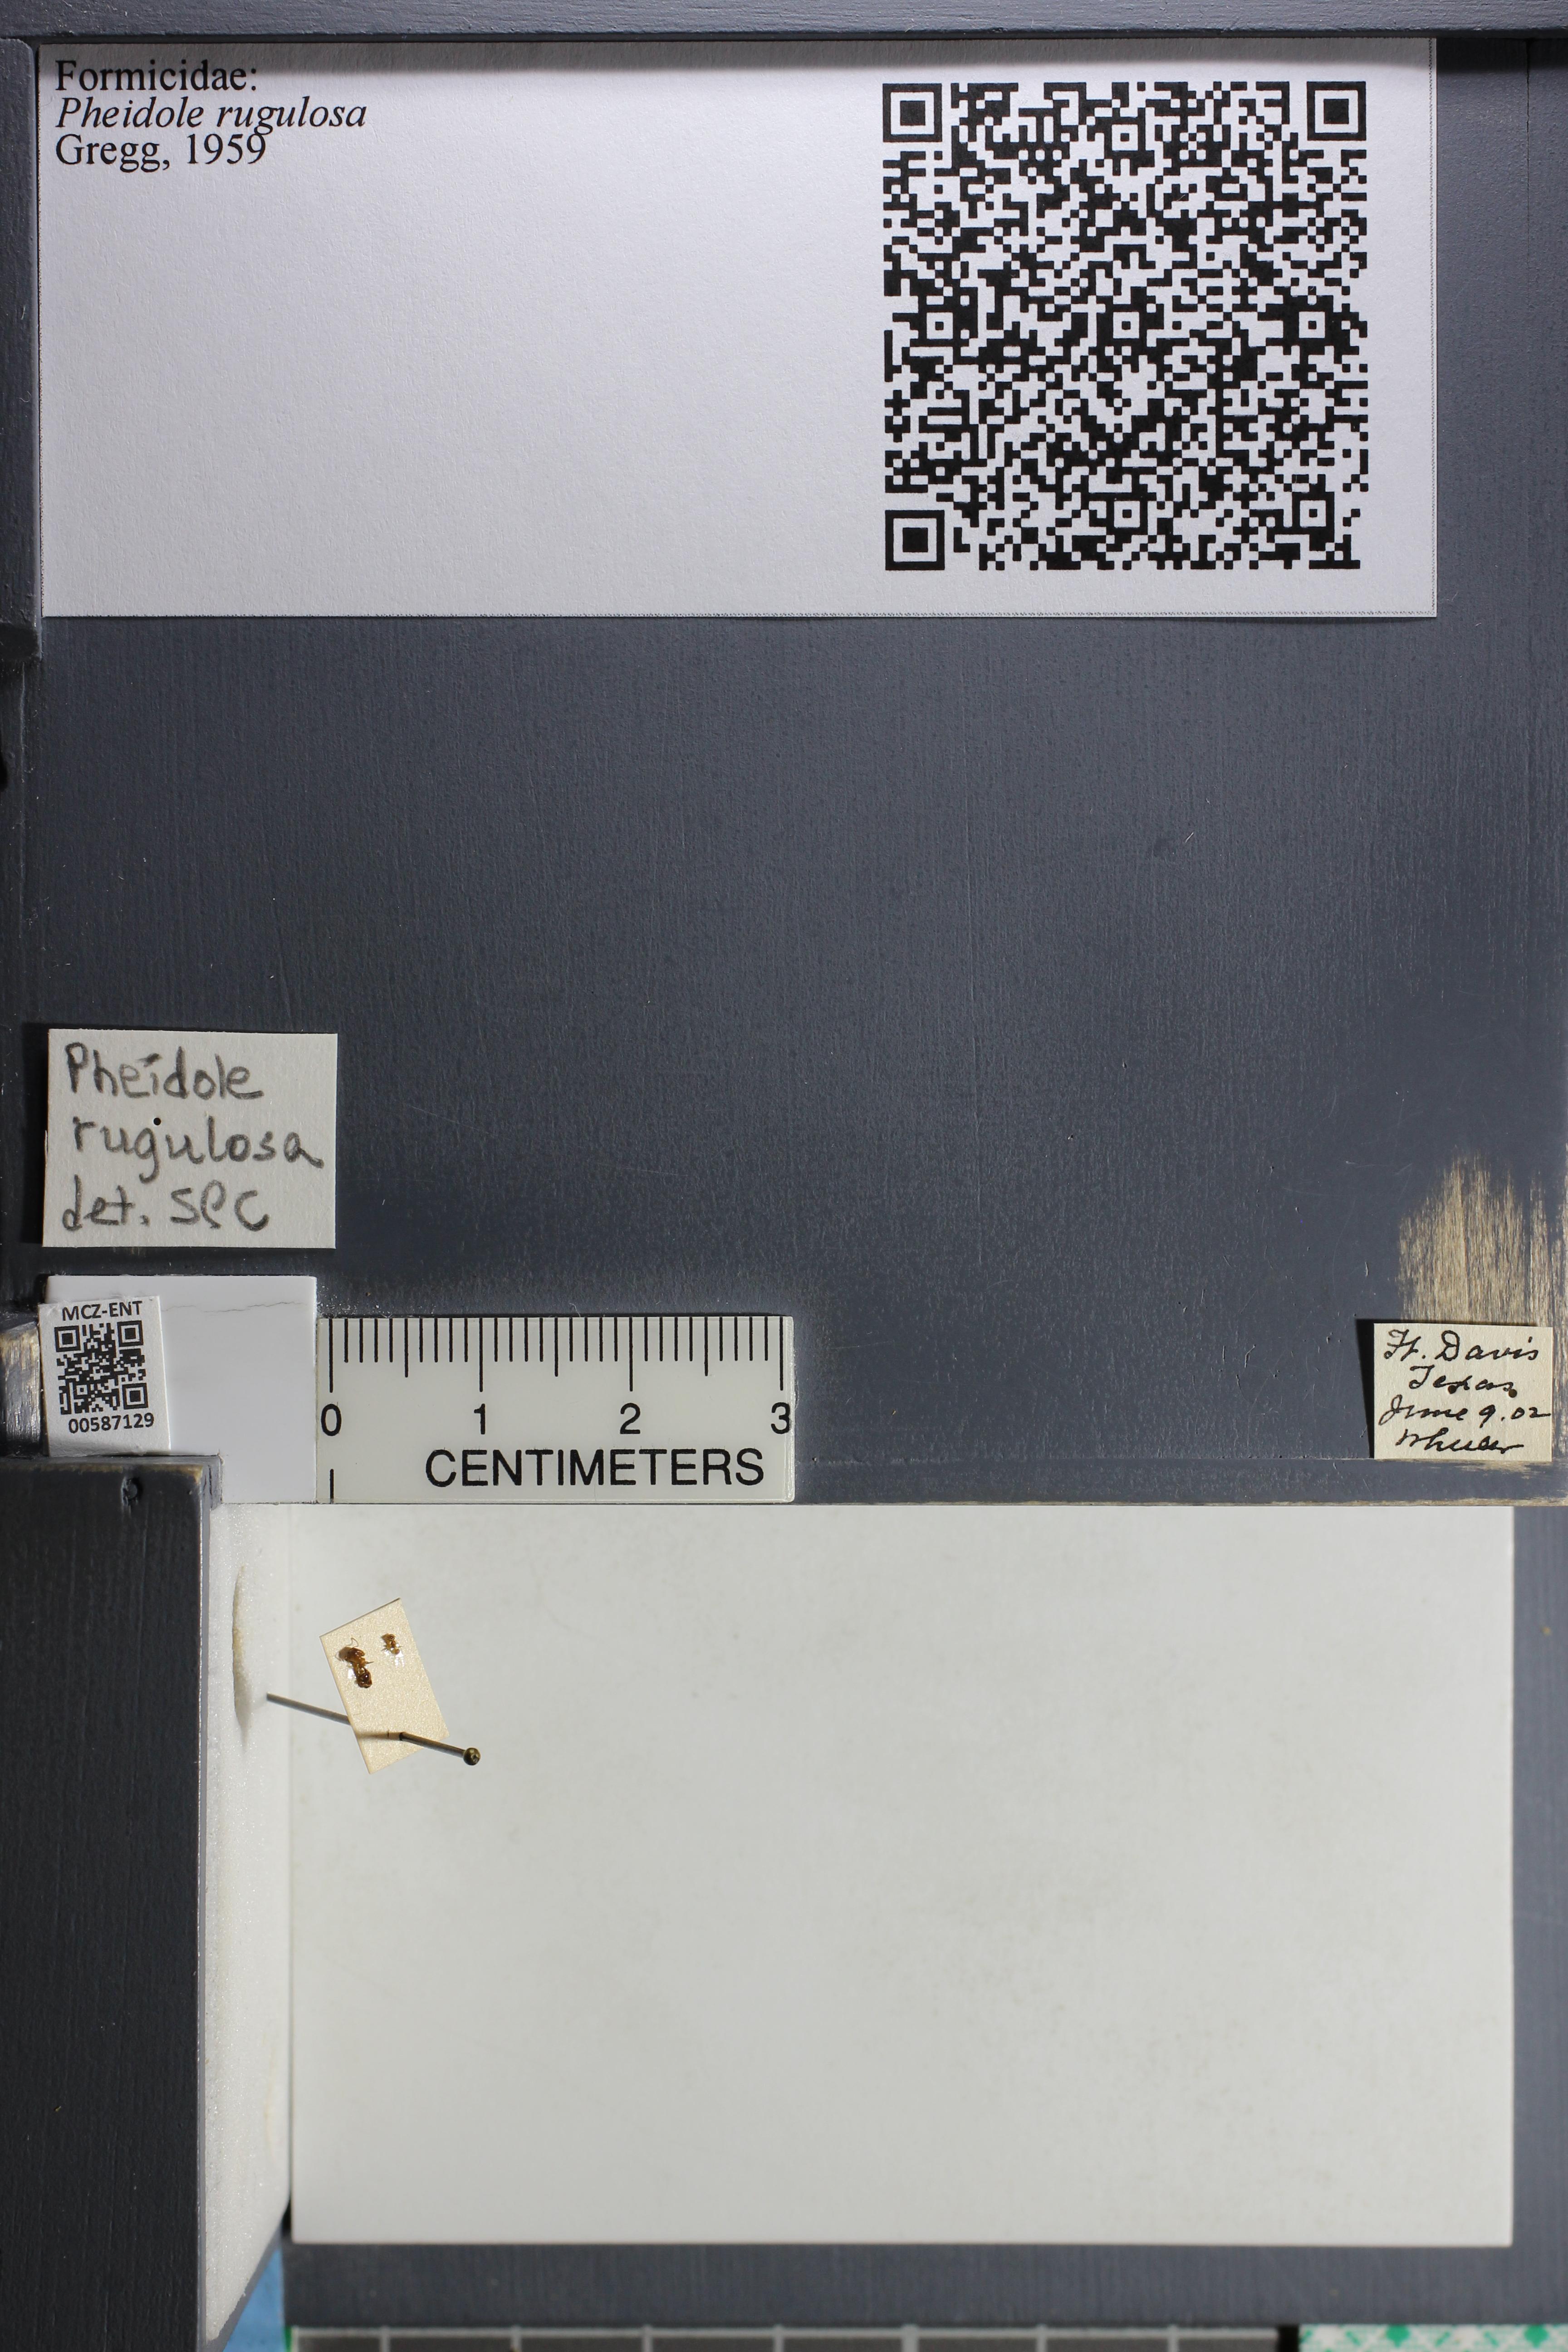 Media of type image, MCZ:Ent:587129 Identified as Pheidole rugulosa.